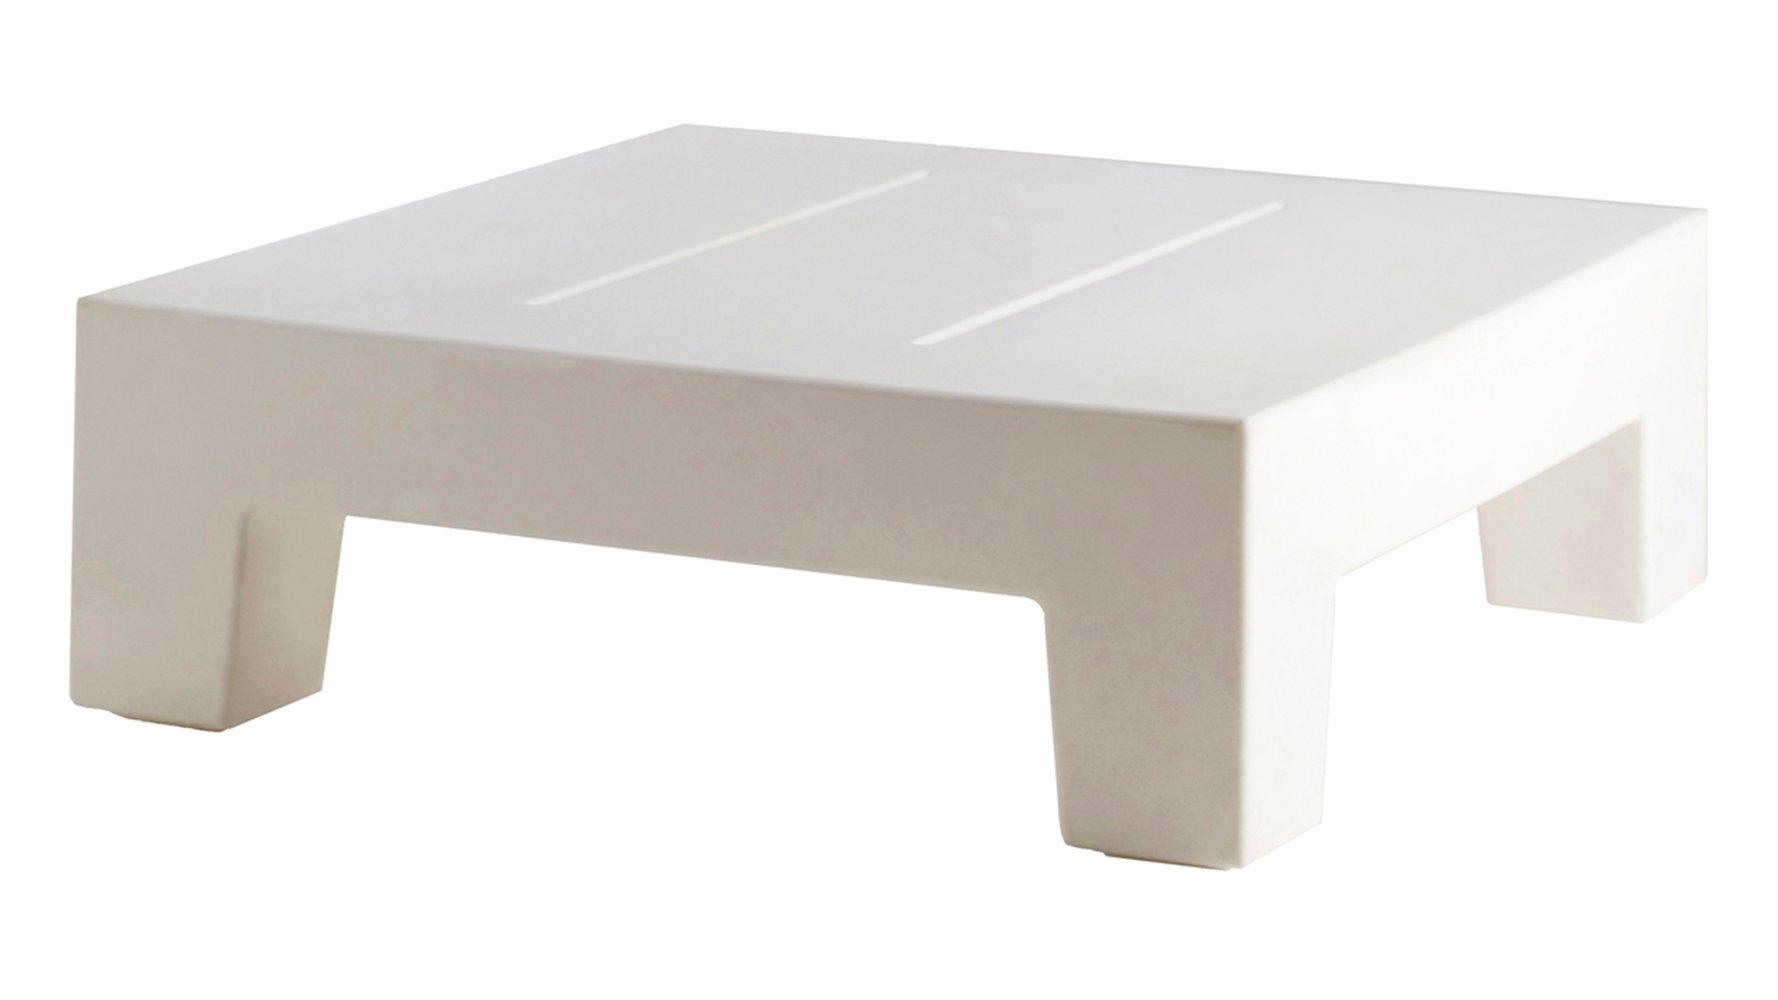 Jut Chaise Lounge Table